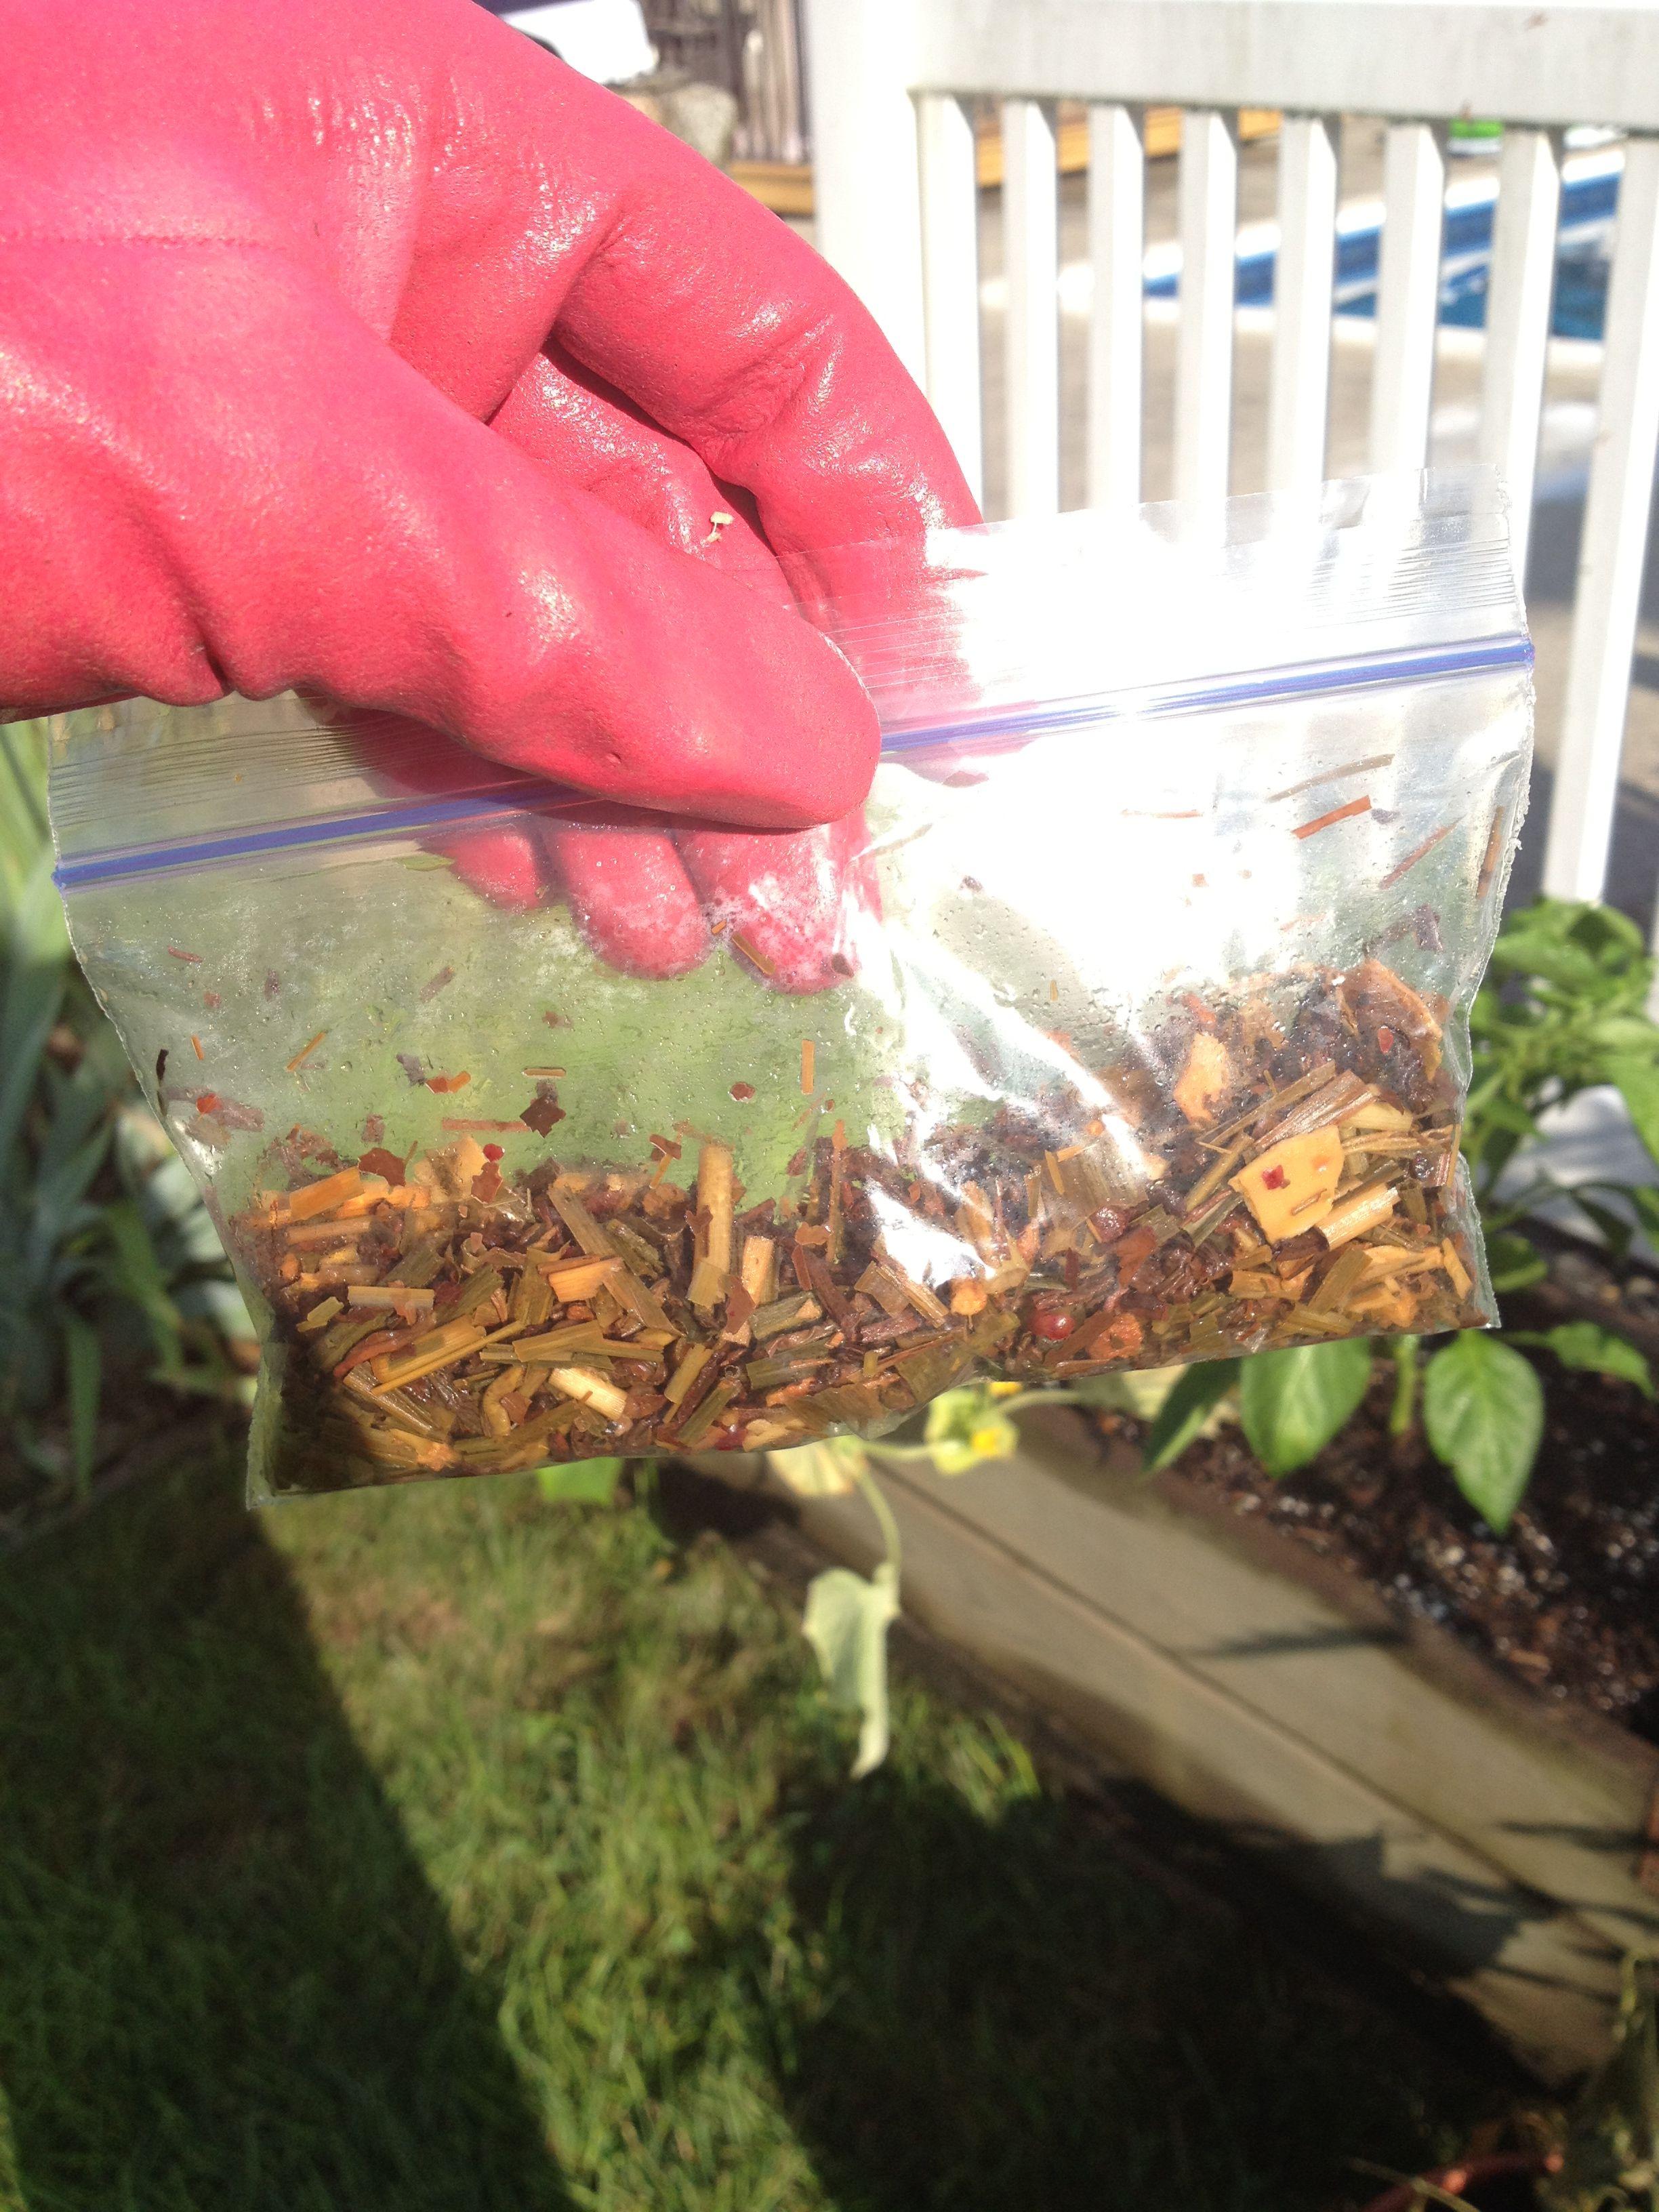 8e8ffccbba536f93c29e974f3a1b9c0c - Use Of Tea Leaves In Gardening